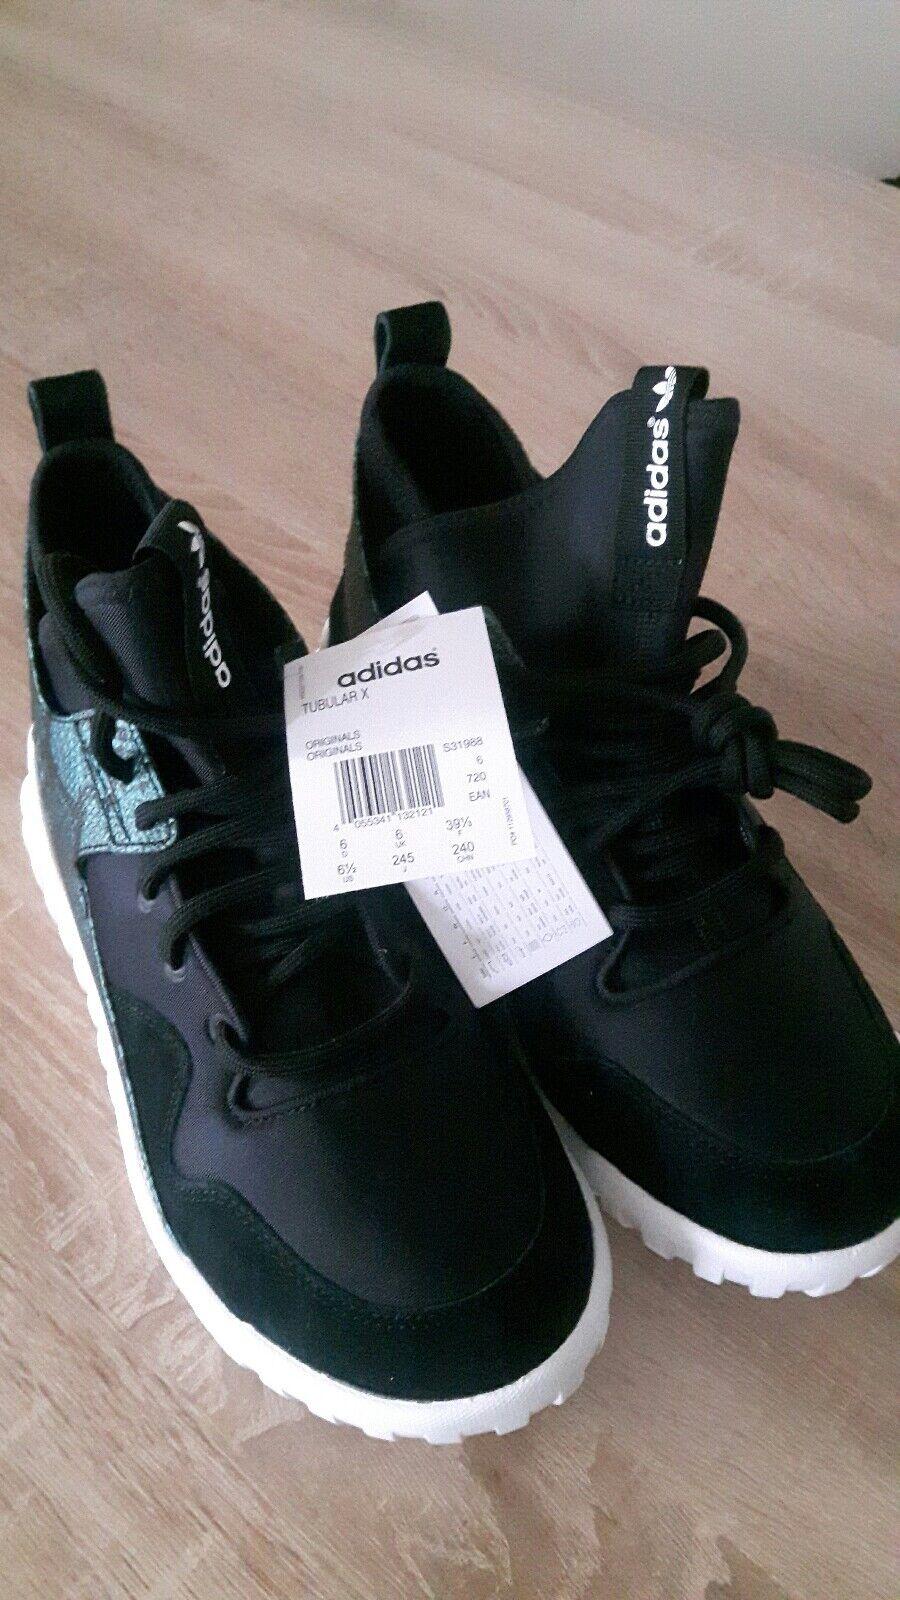 Adidas Tubular X Originals, Gr. Gr. Gr. 6 a9ff51